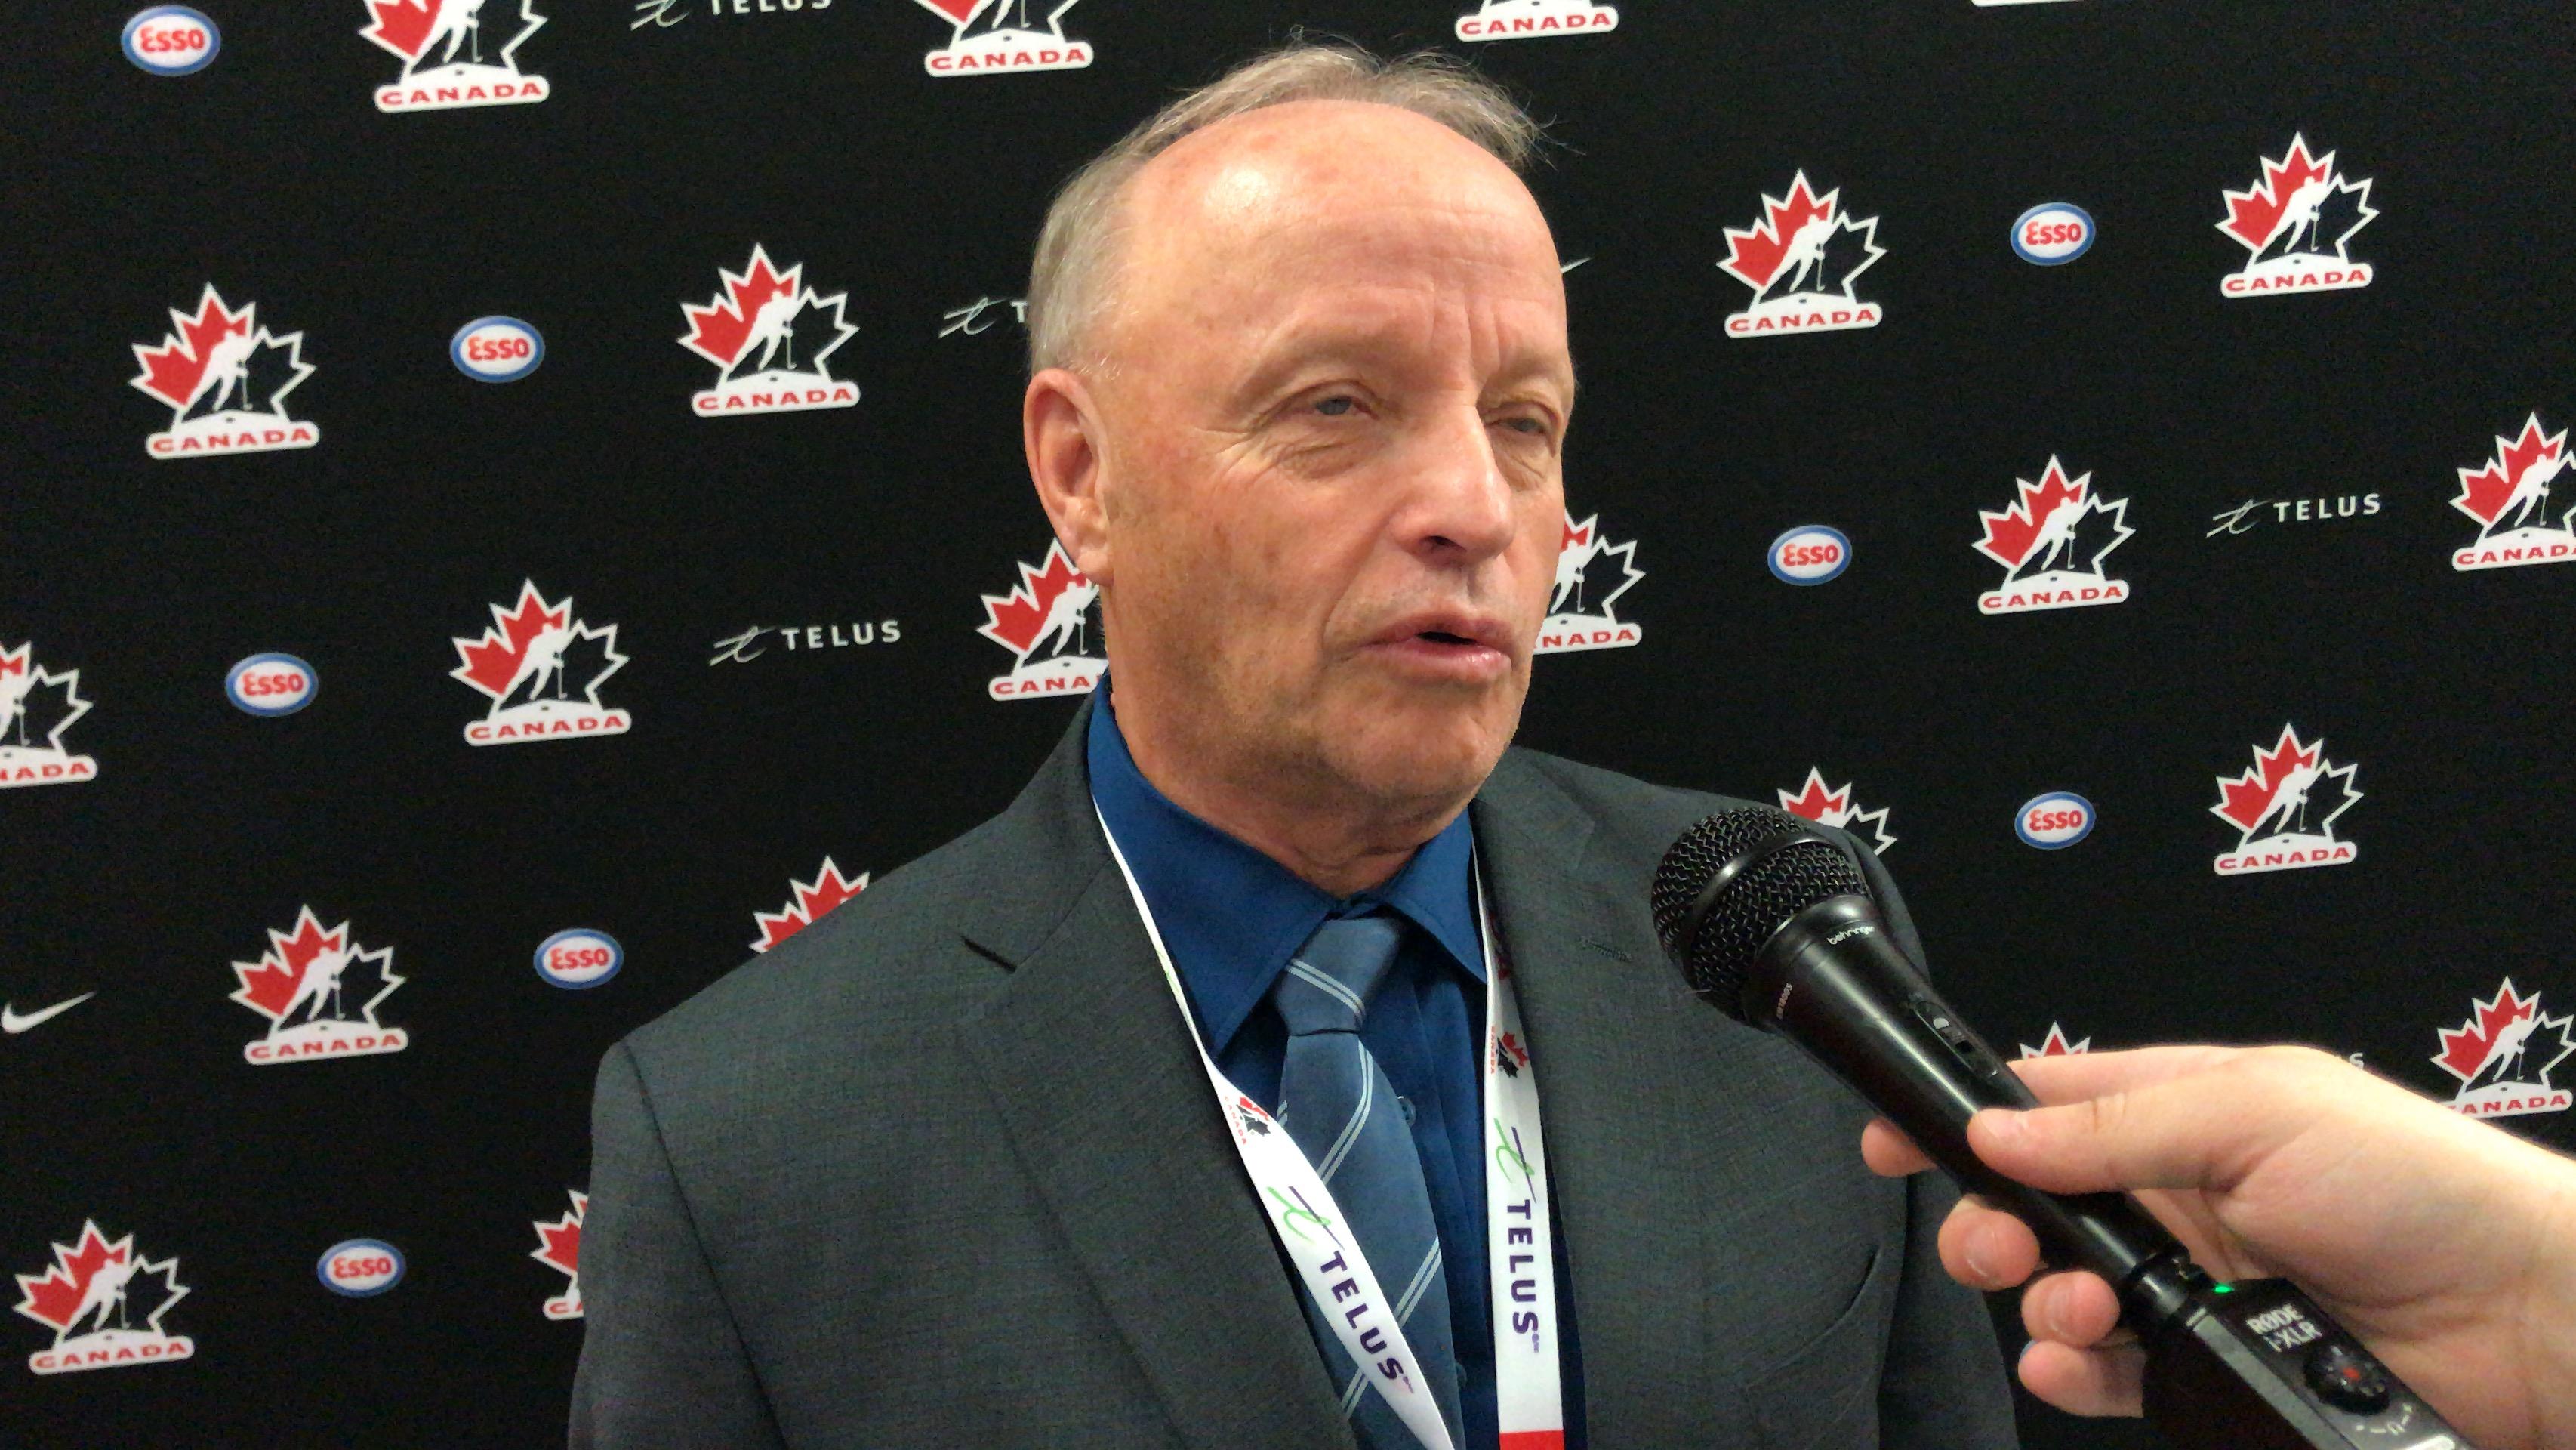 Canadian Junior Hockey League Top 20 Rankings Not An Exact Science